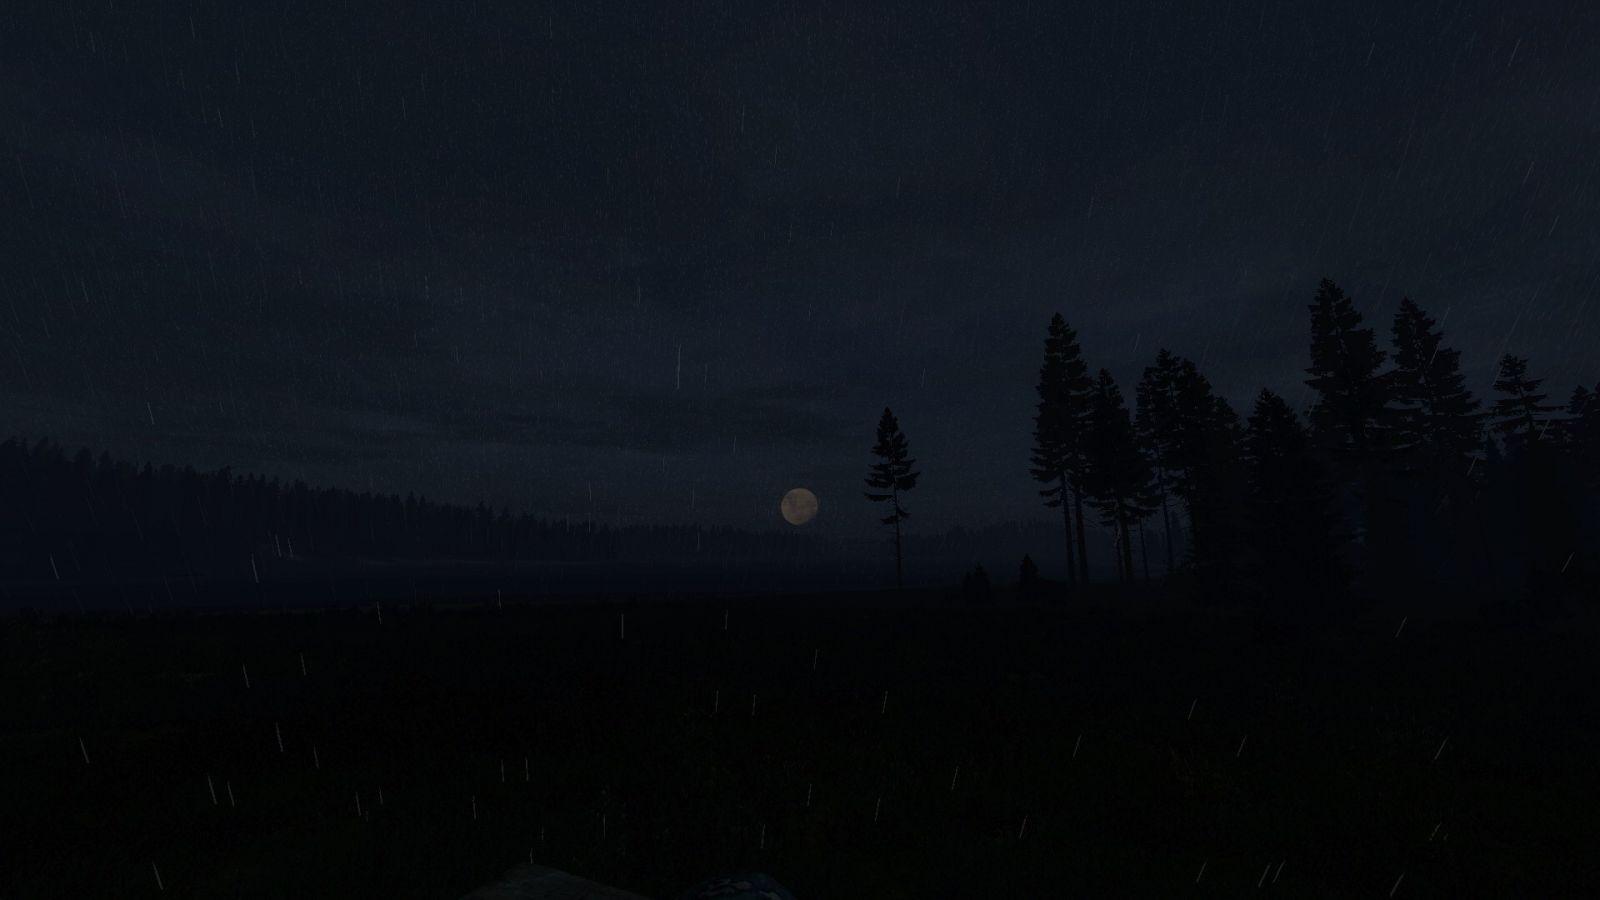 Raining during a full moon.